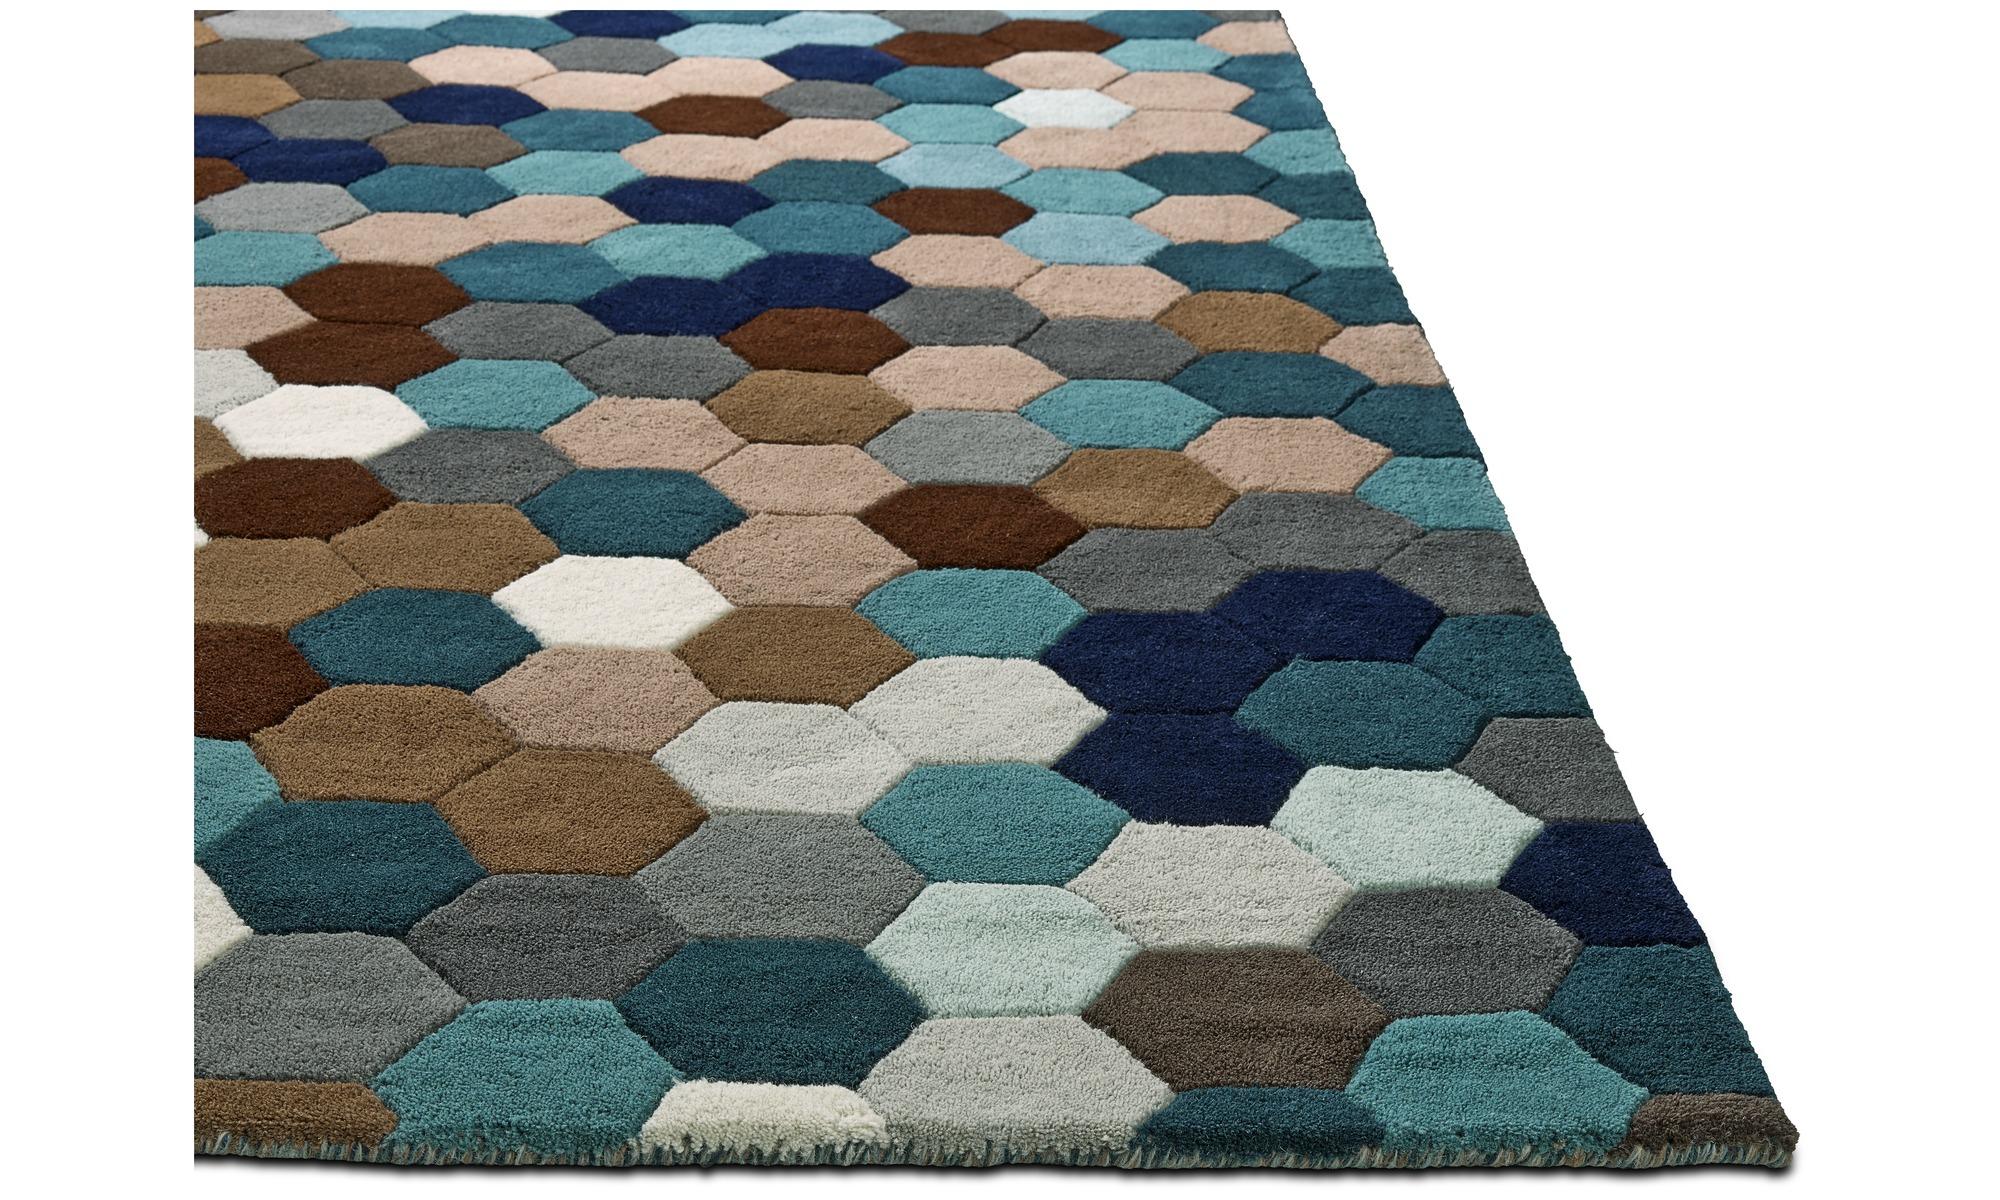 boconcept rugs rugs ideas. Black Bedroom Furniture Sets. Home Design Ideas